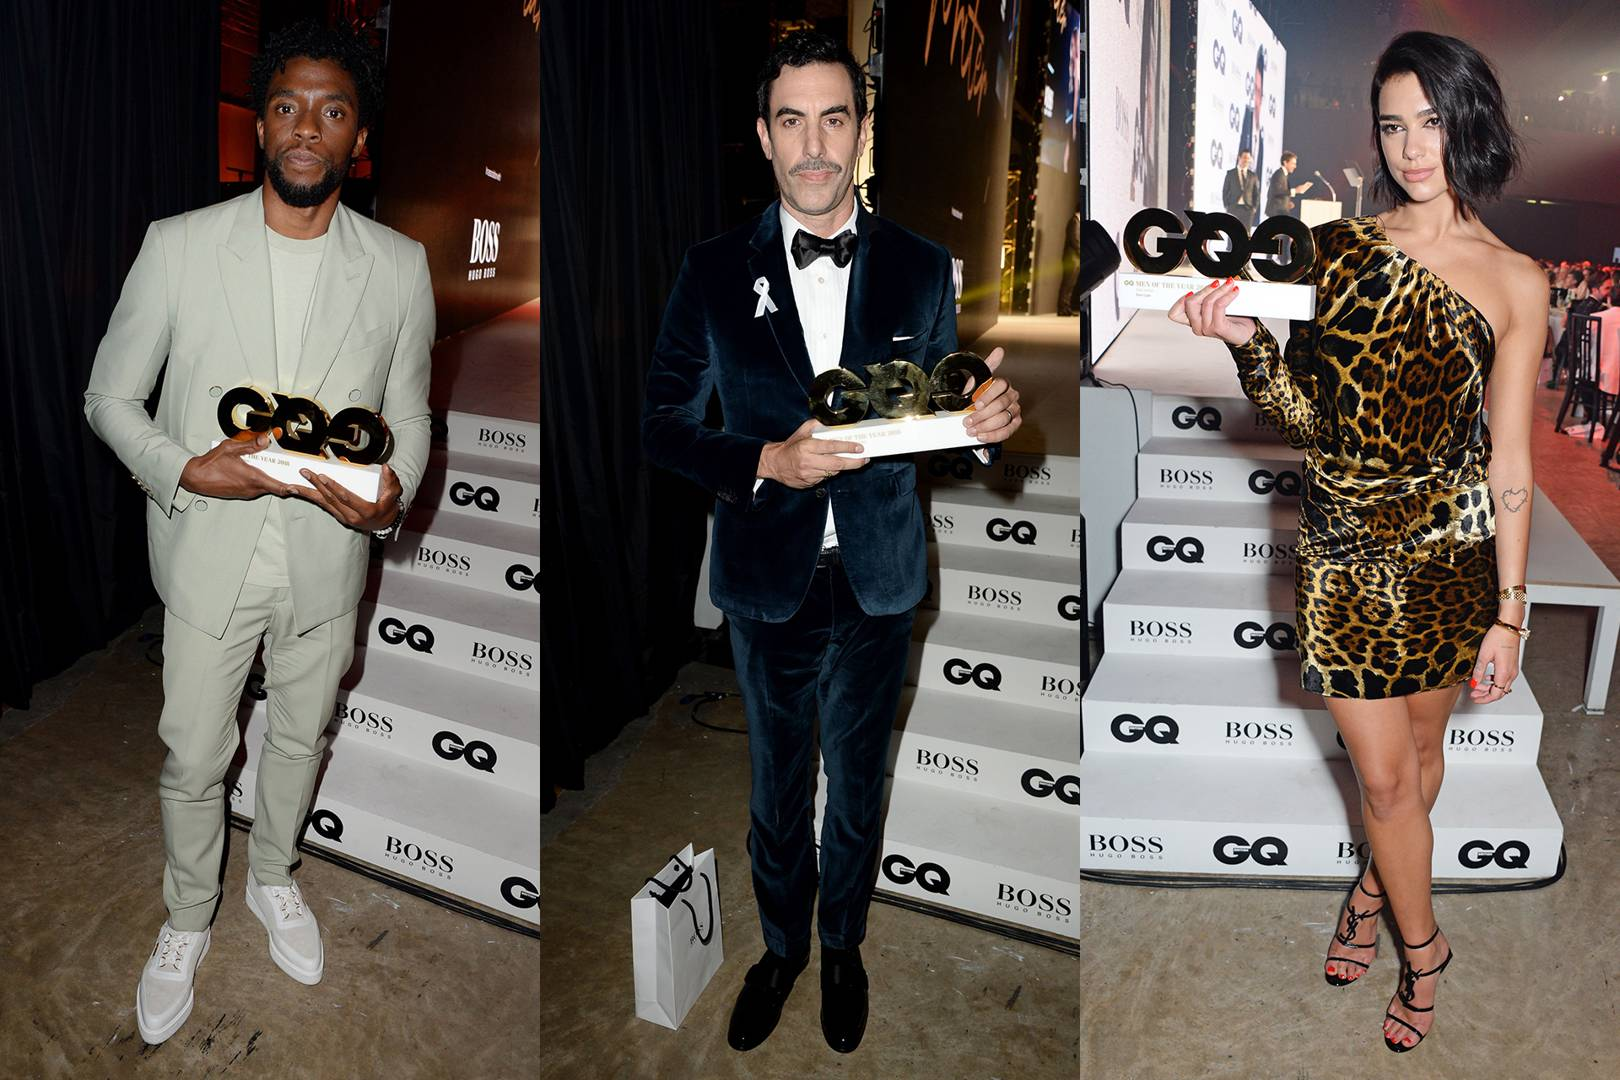 c3cfb07382 GQ Award 2018 winners  The full list